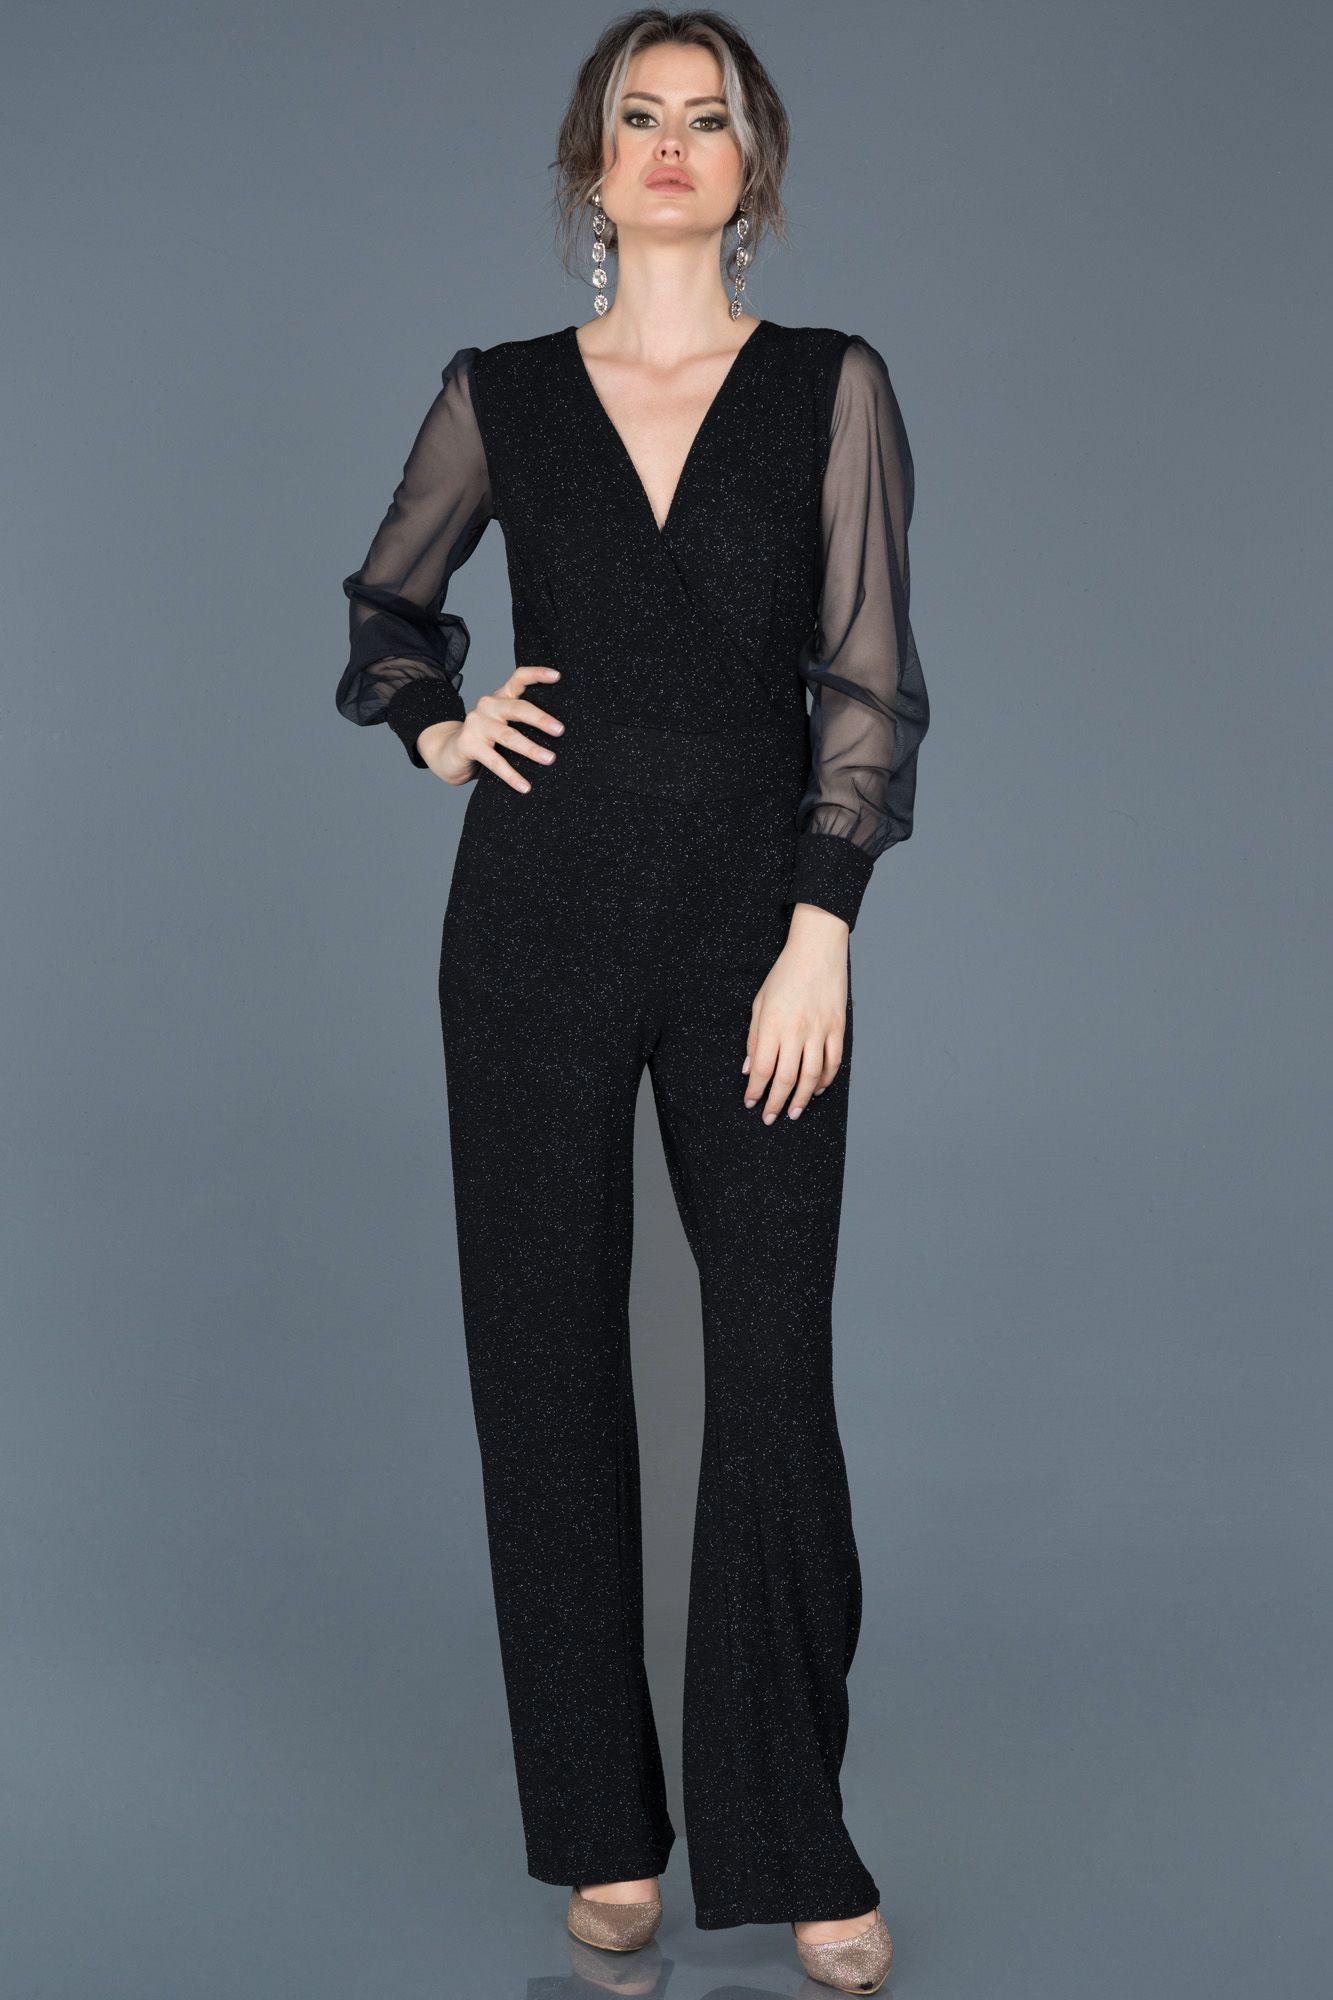 2020 Bayan Abiye Tulum Modelleri Siyah Kolsuz V Yakali Cizgi Desen Detayli 2020 Kiyafet Tulumlar Moda Kiyafetler